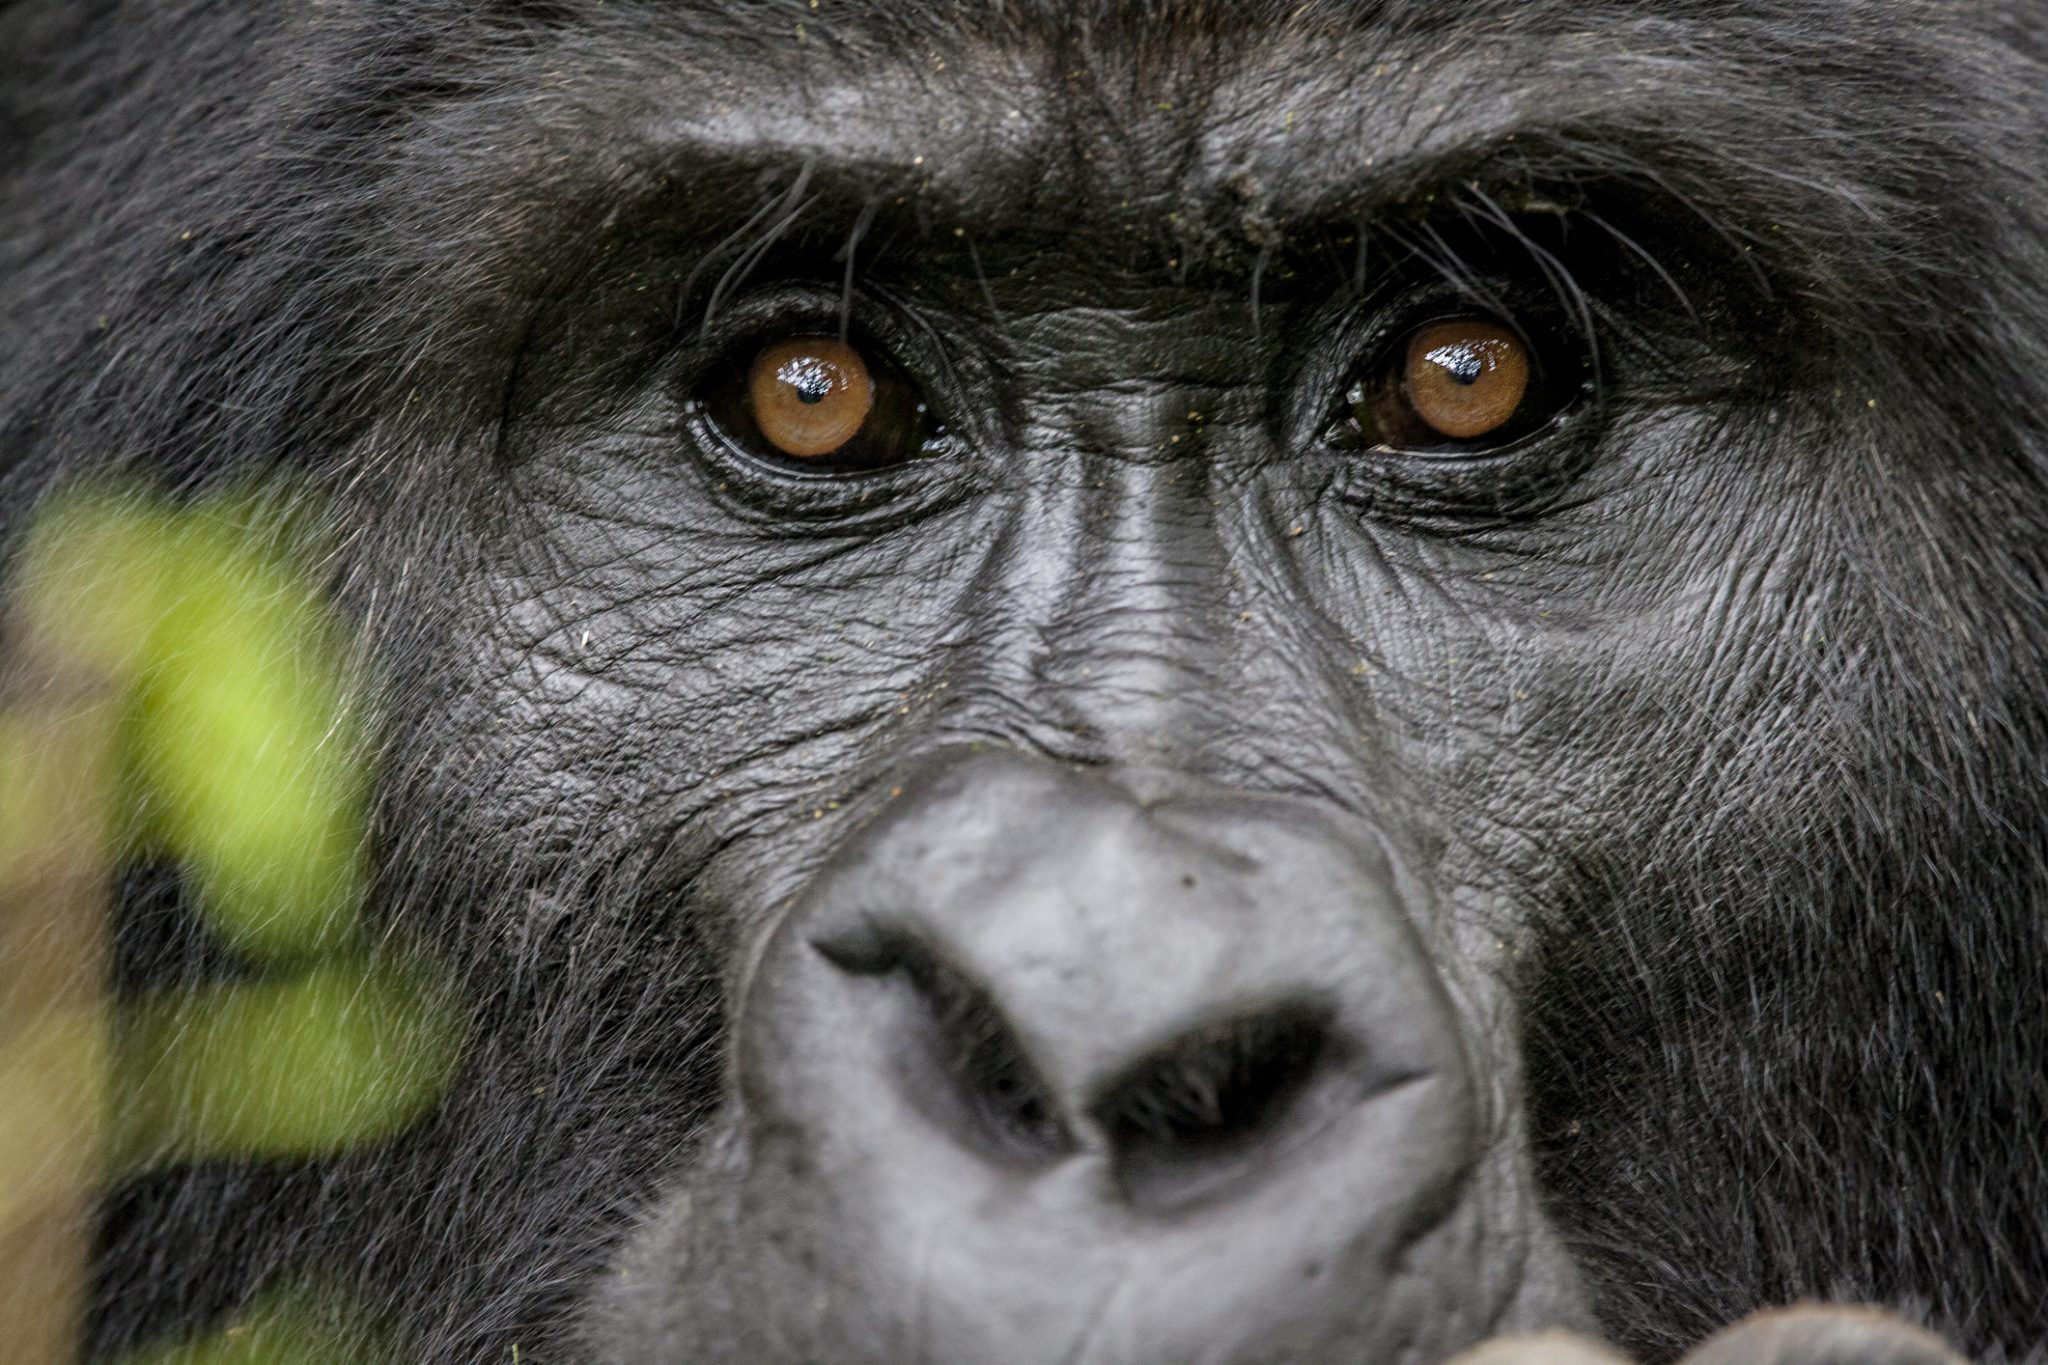 Portrait of the Endangered Silverback Mountain Gorillas